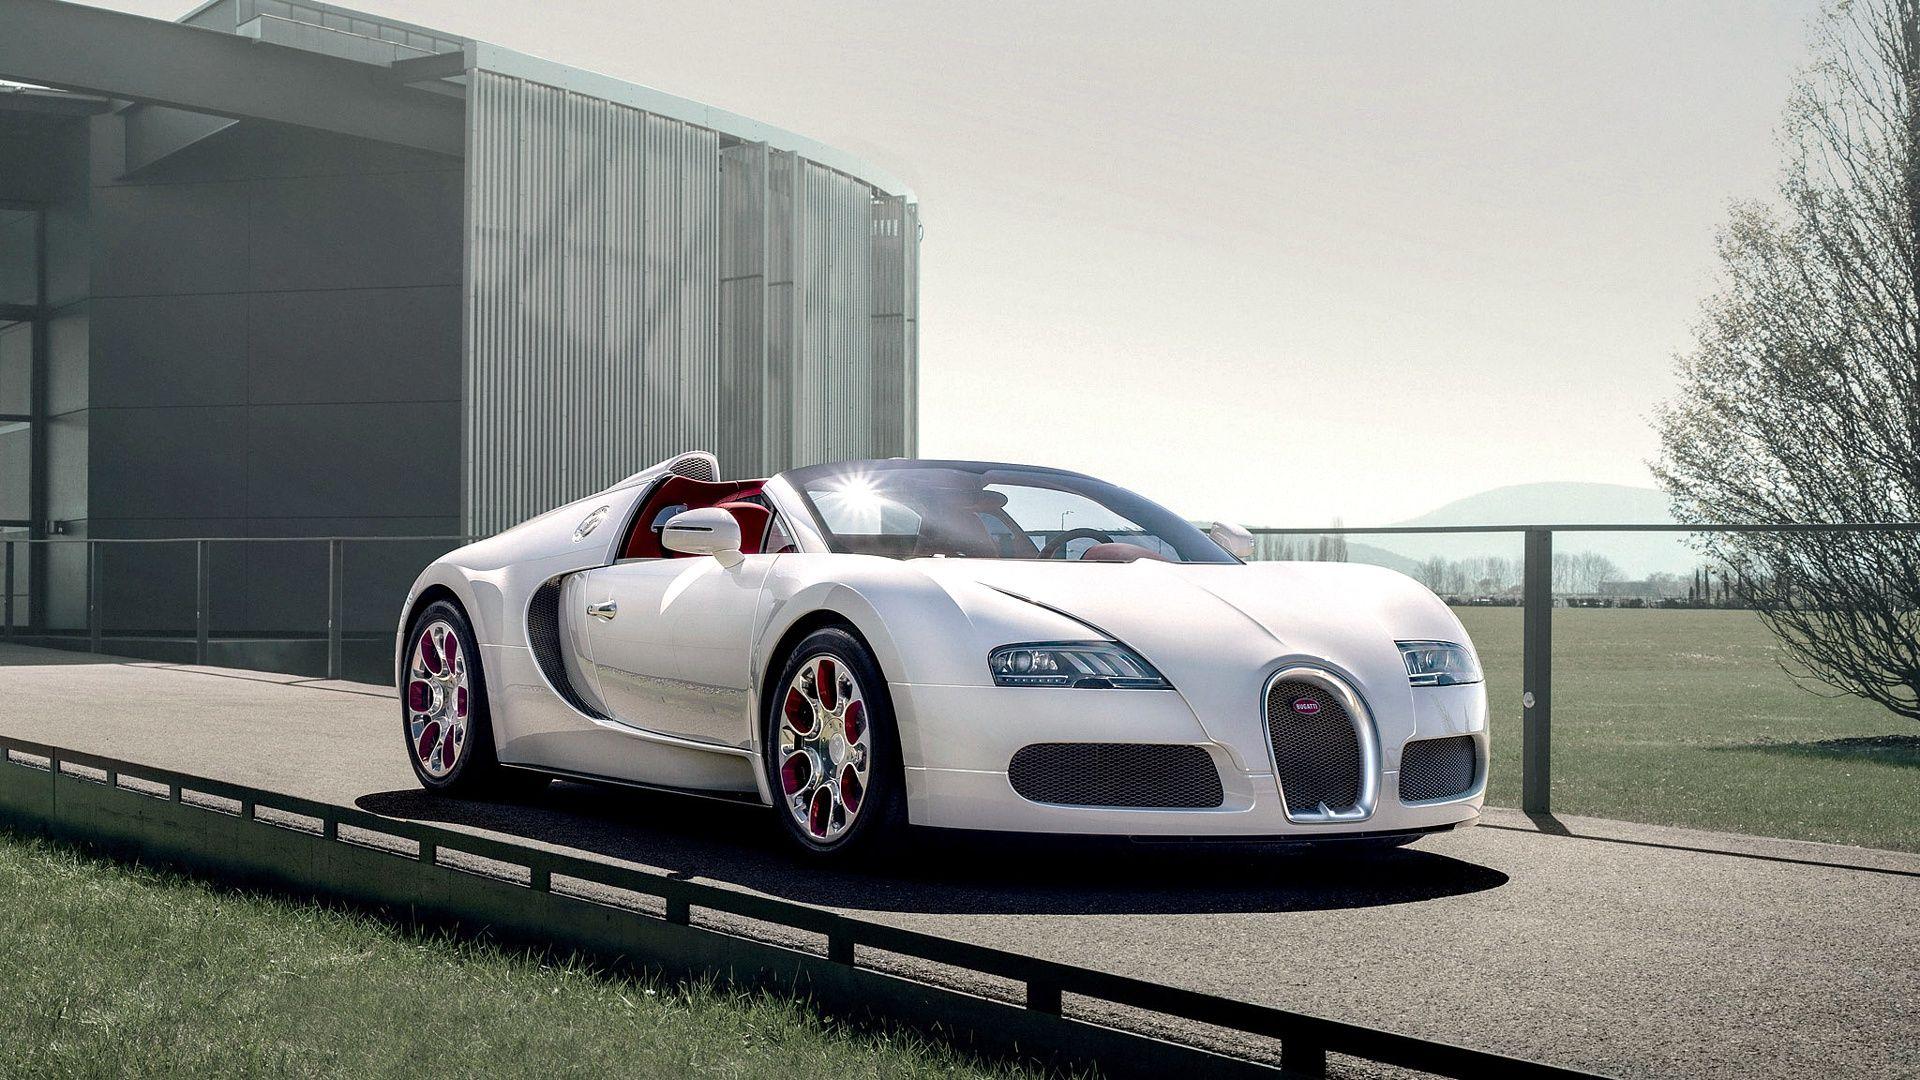 b18f06feb563feab9efc564336839b3c Fascinating Bugatti Veyron Grand Sport Vitesse 1/4 Mile Cars Trend